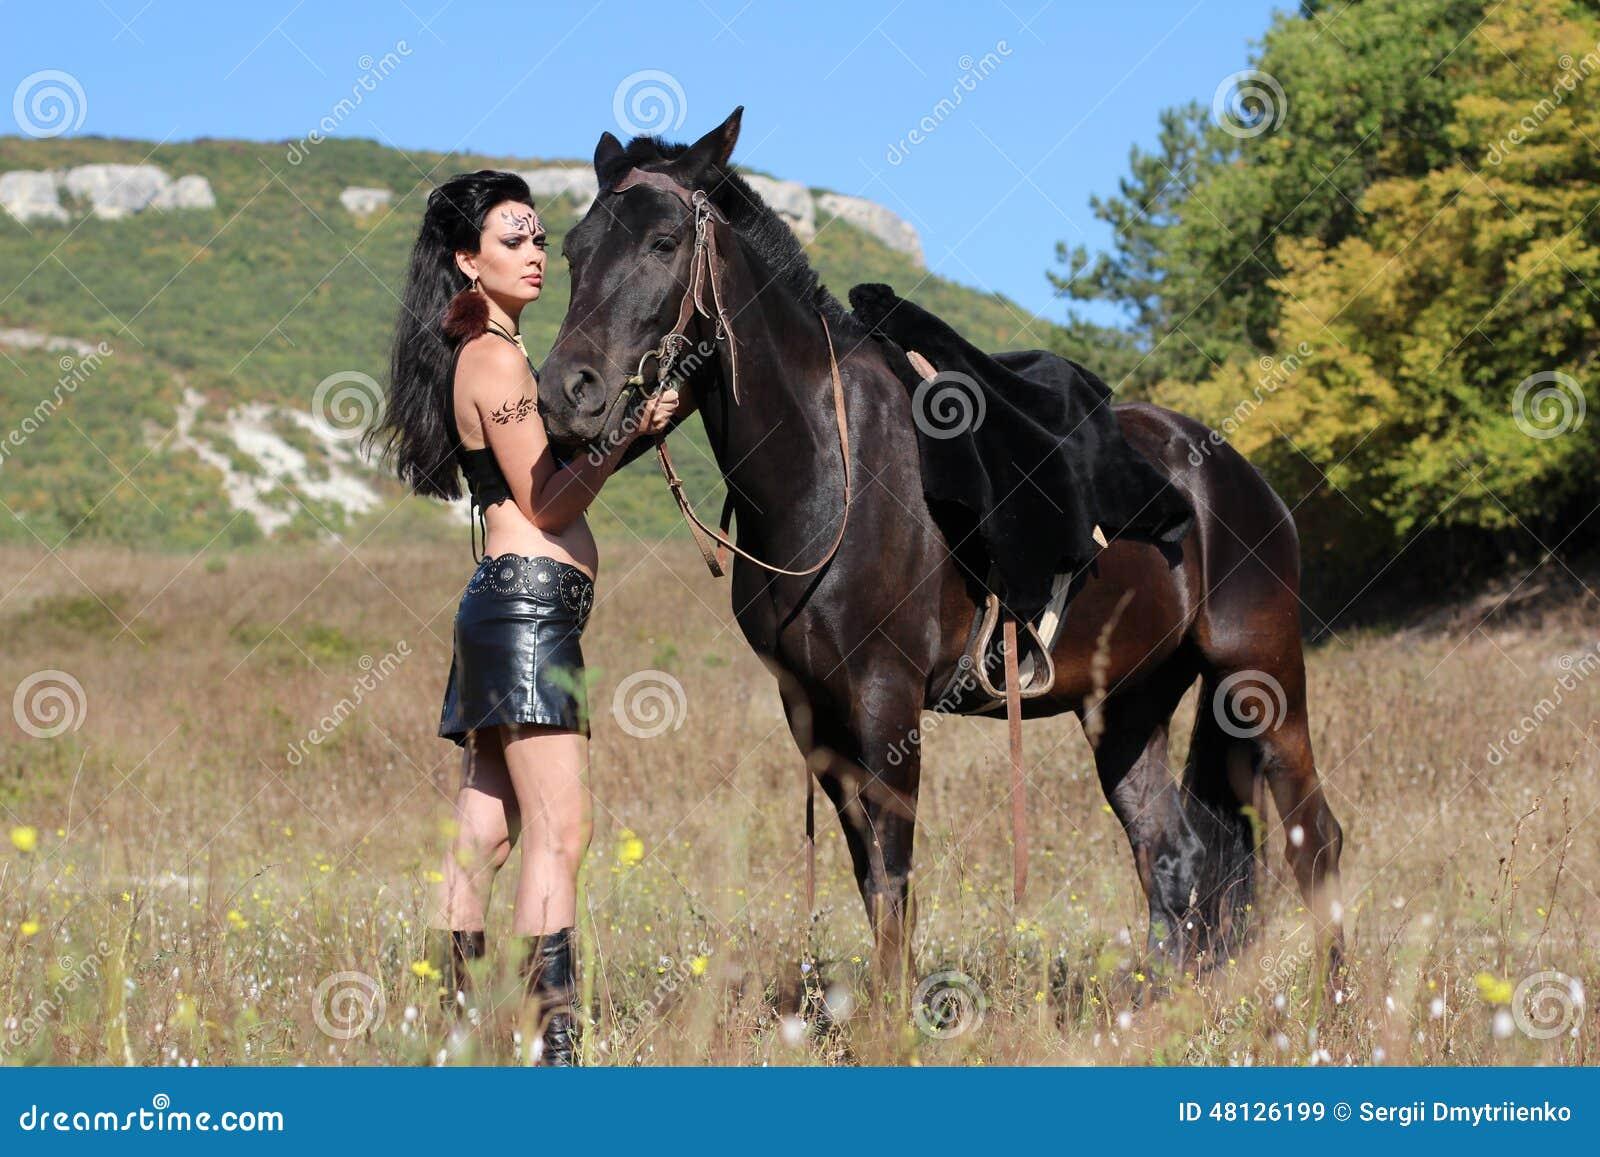 Girl Warrior Amazon With A Black Horse Stock Photo